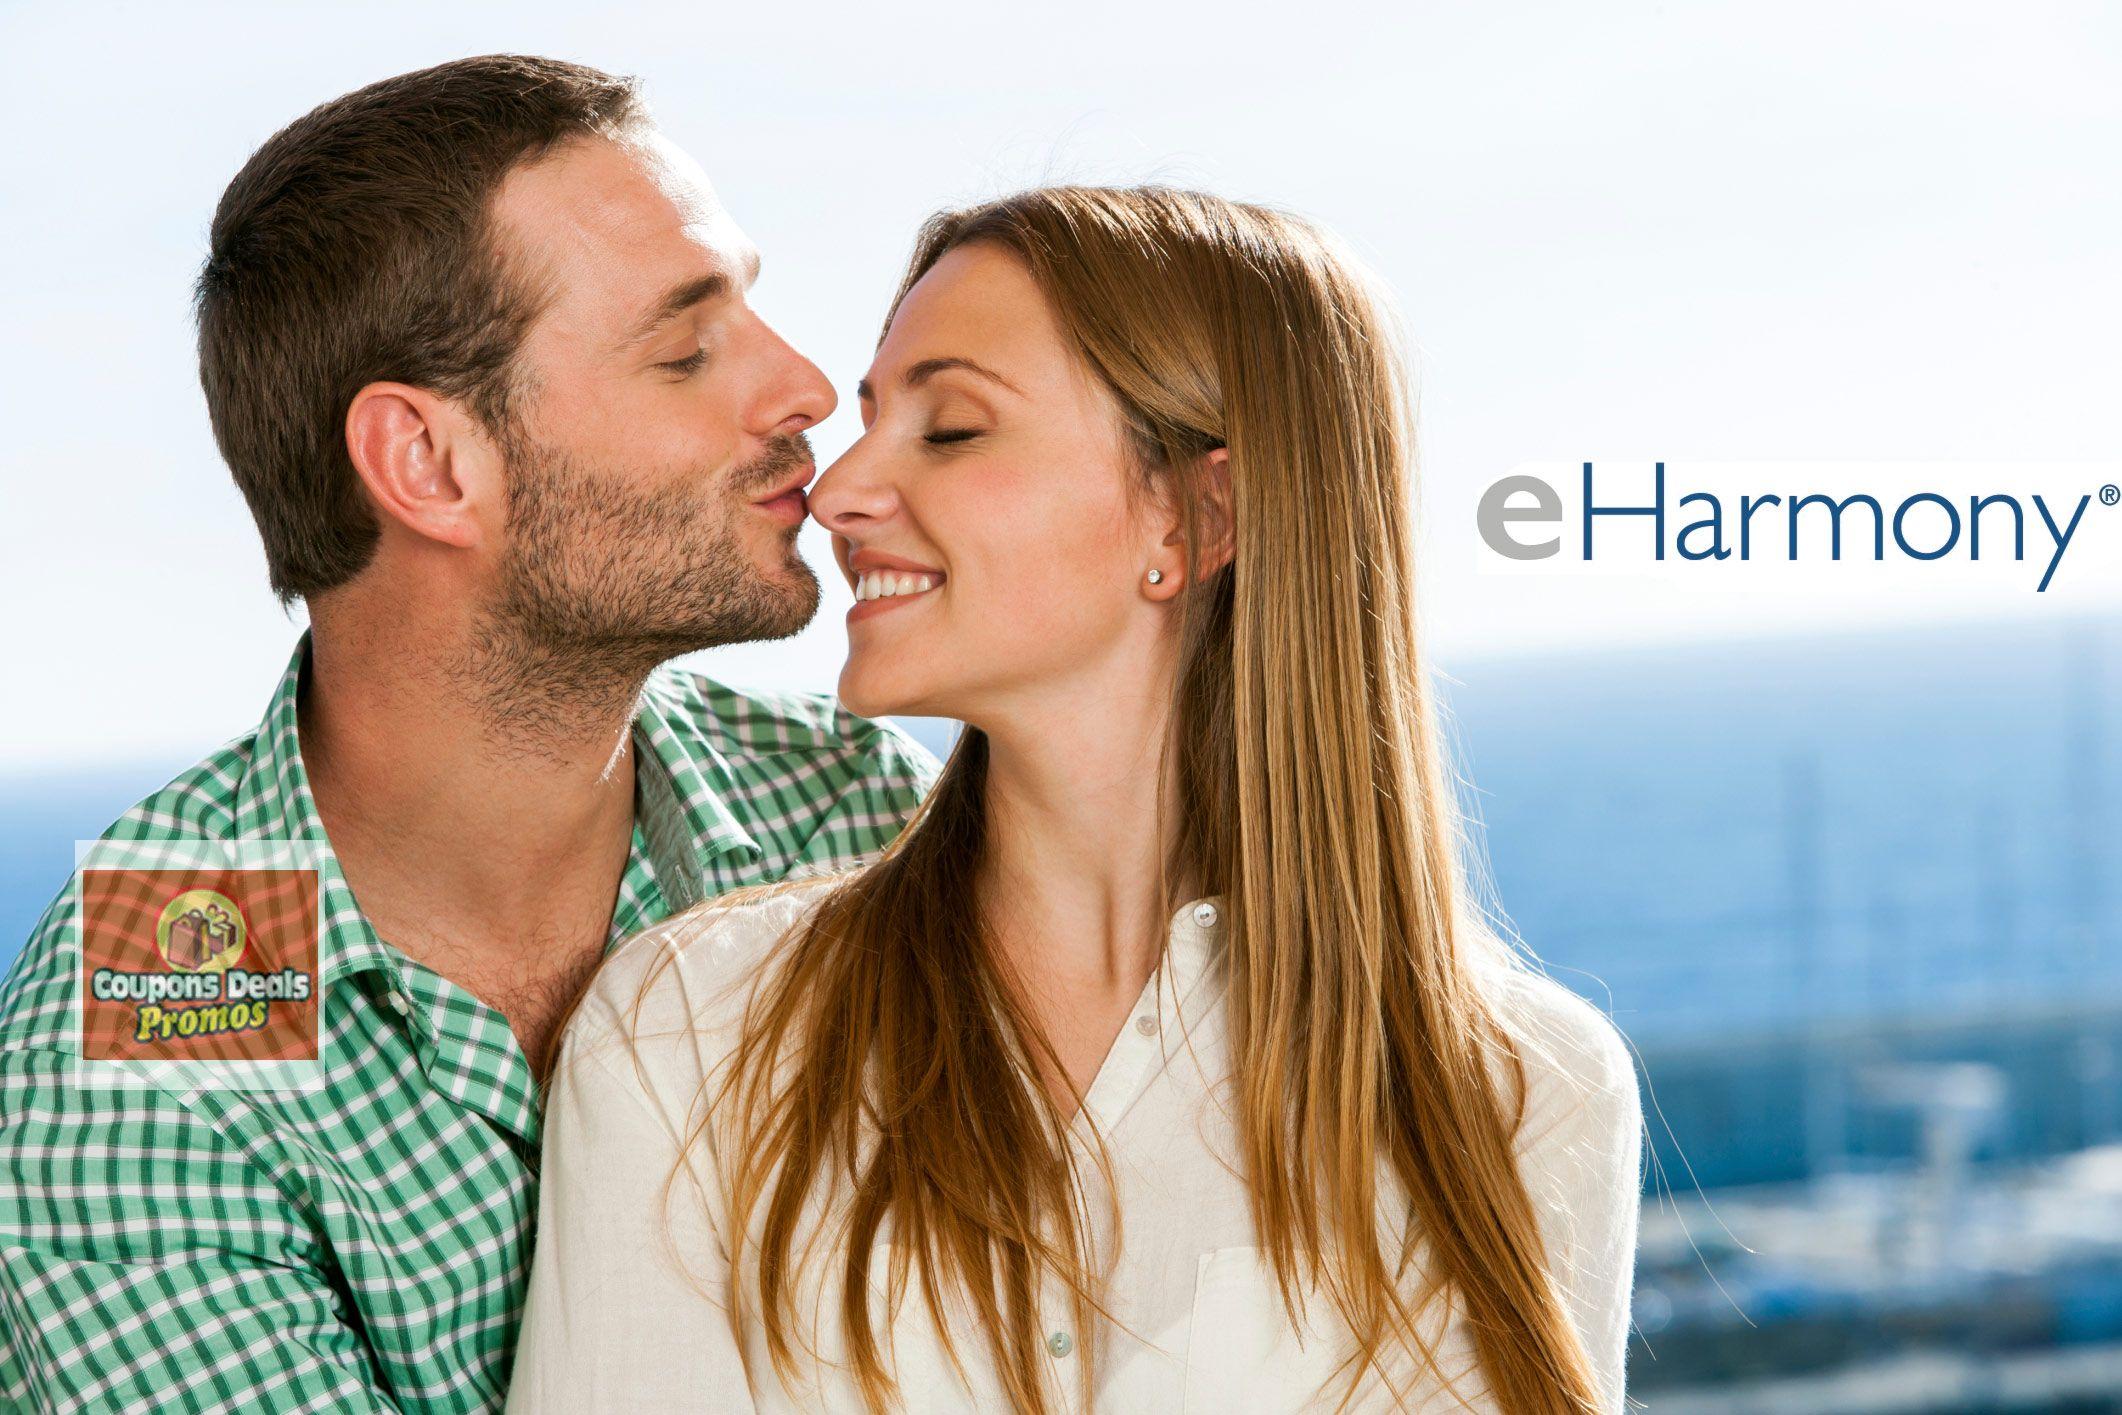 is eharmony free this weekend